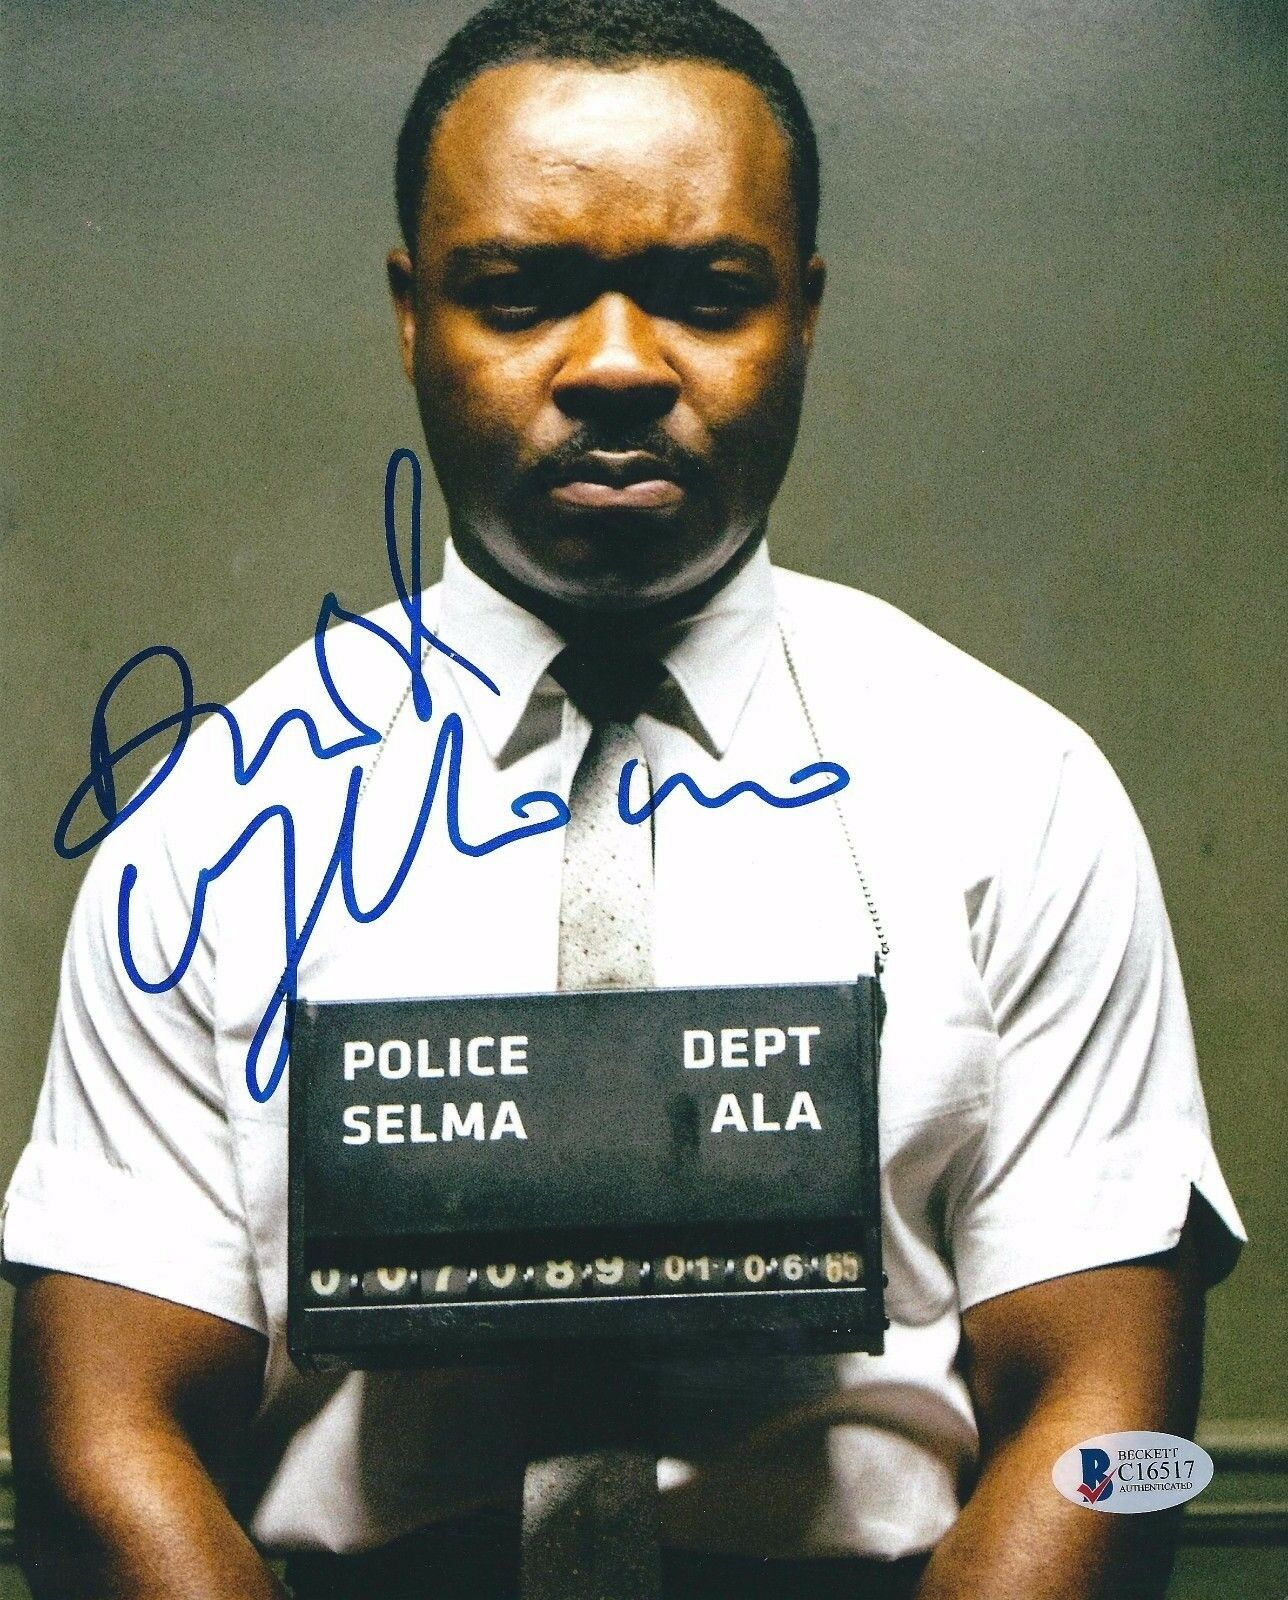 David Oyelowo Signed 8x10 Photo *Jack Reacher *Selma Beckett BAS C16517